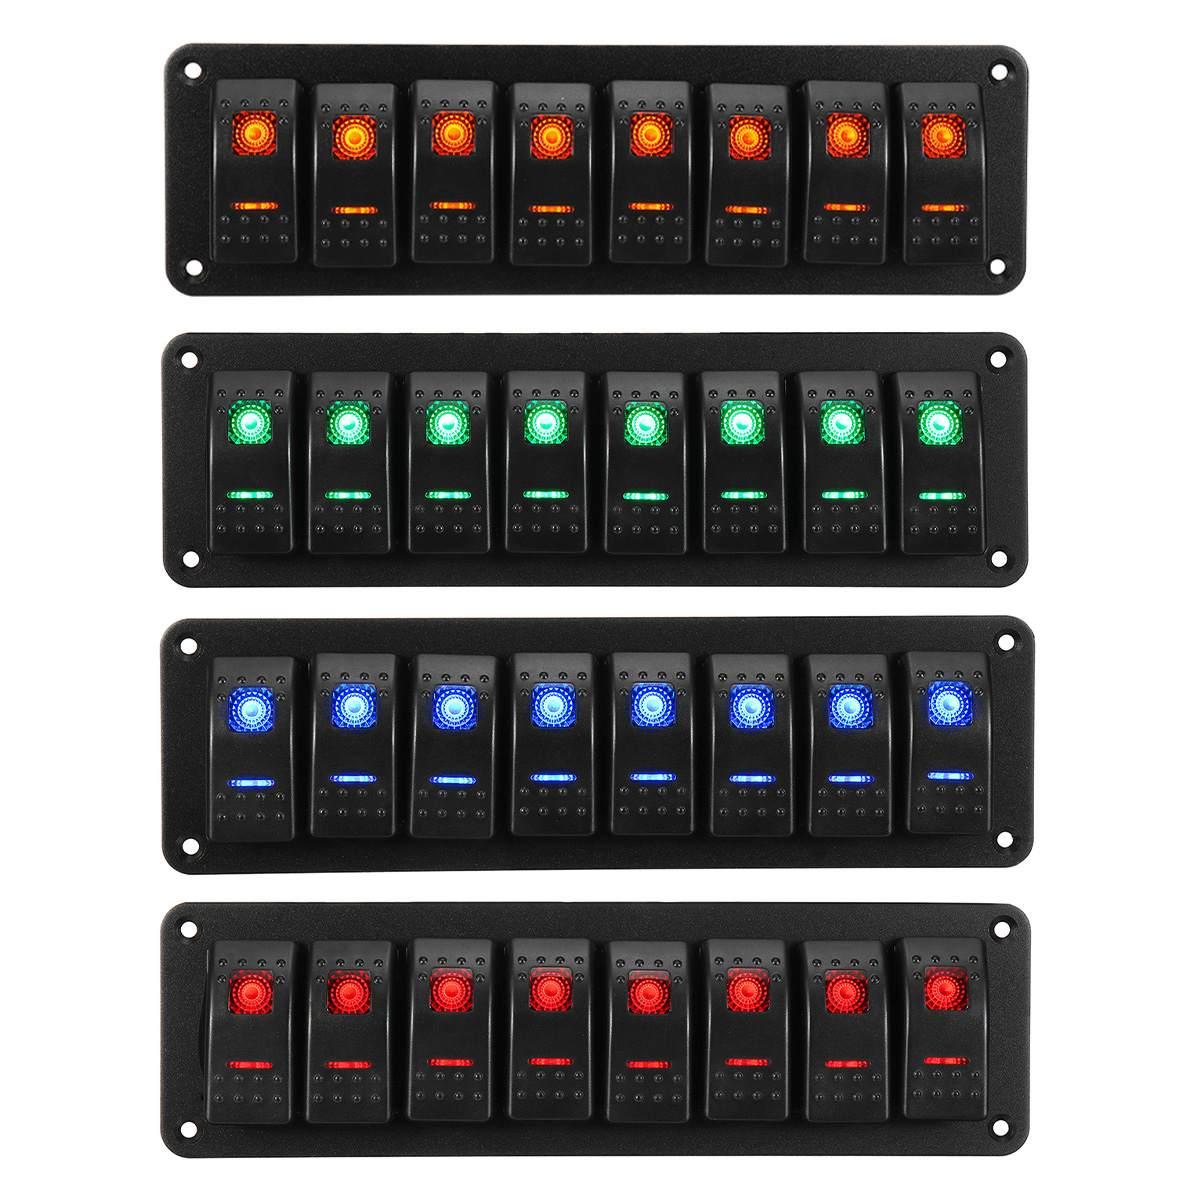 Waterproof 8 Gang Rocker Switch Panel Kit 12V 24V Circuit Breaker Green/Blue/Red/Orange LED Marine Boat Rocker Switch Panel